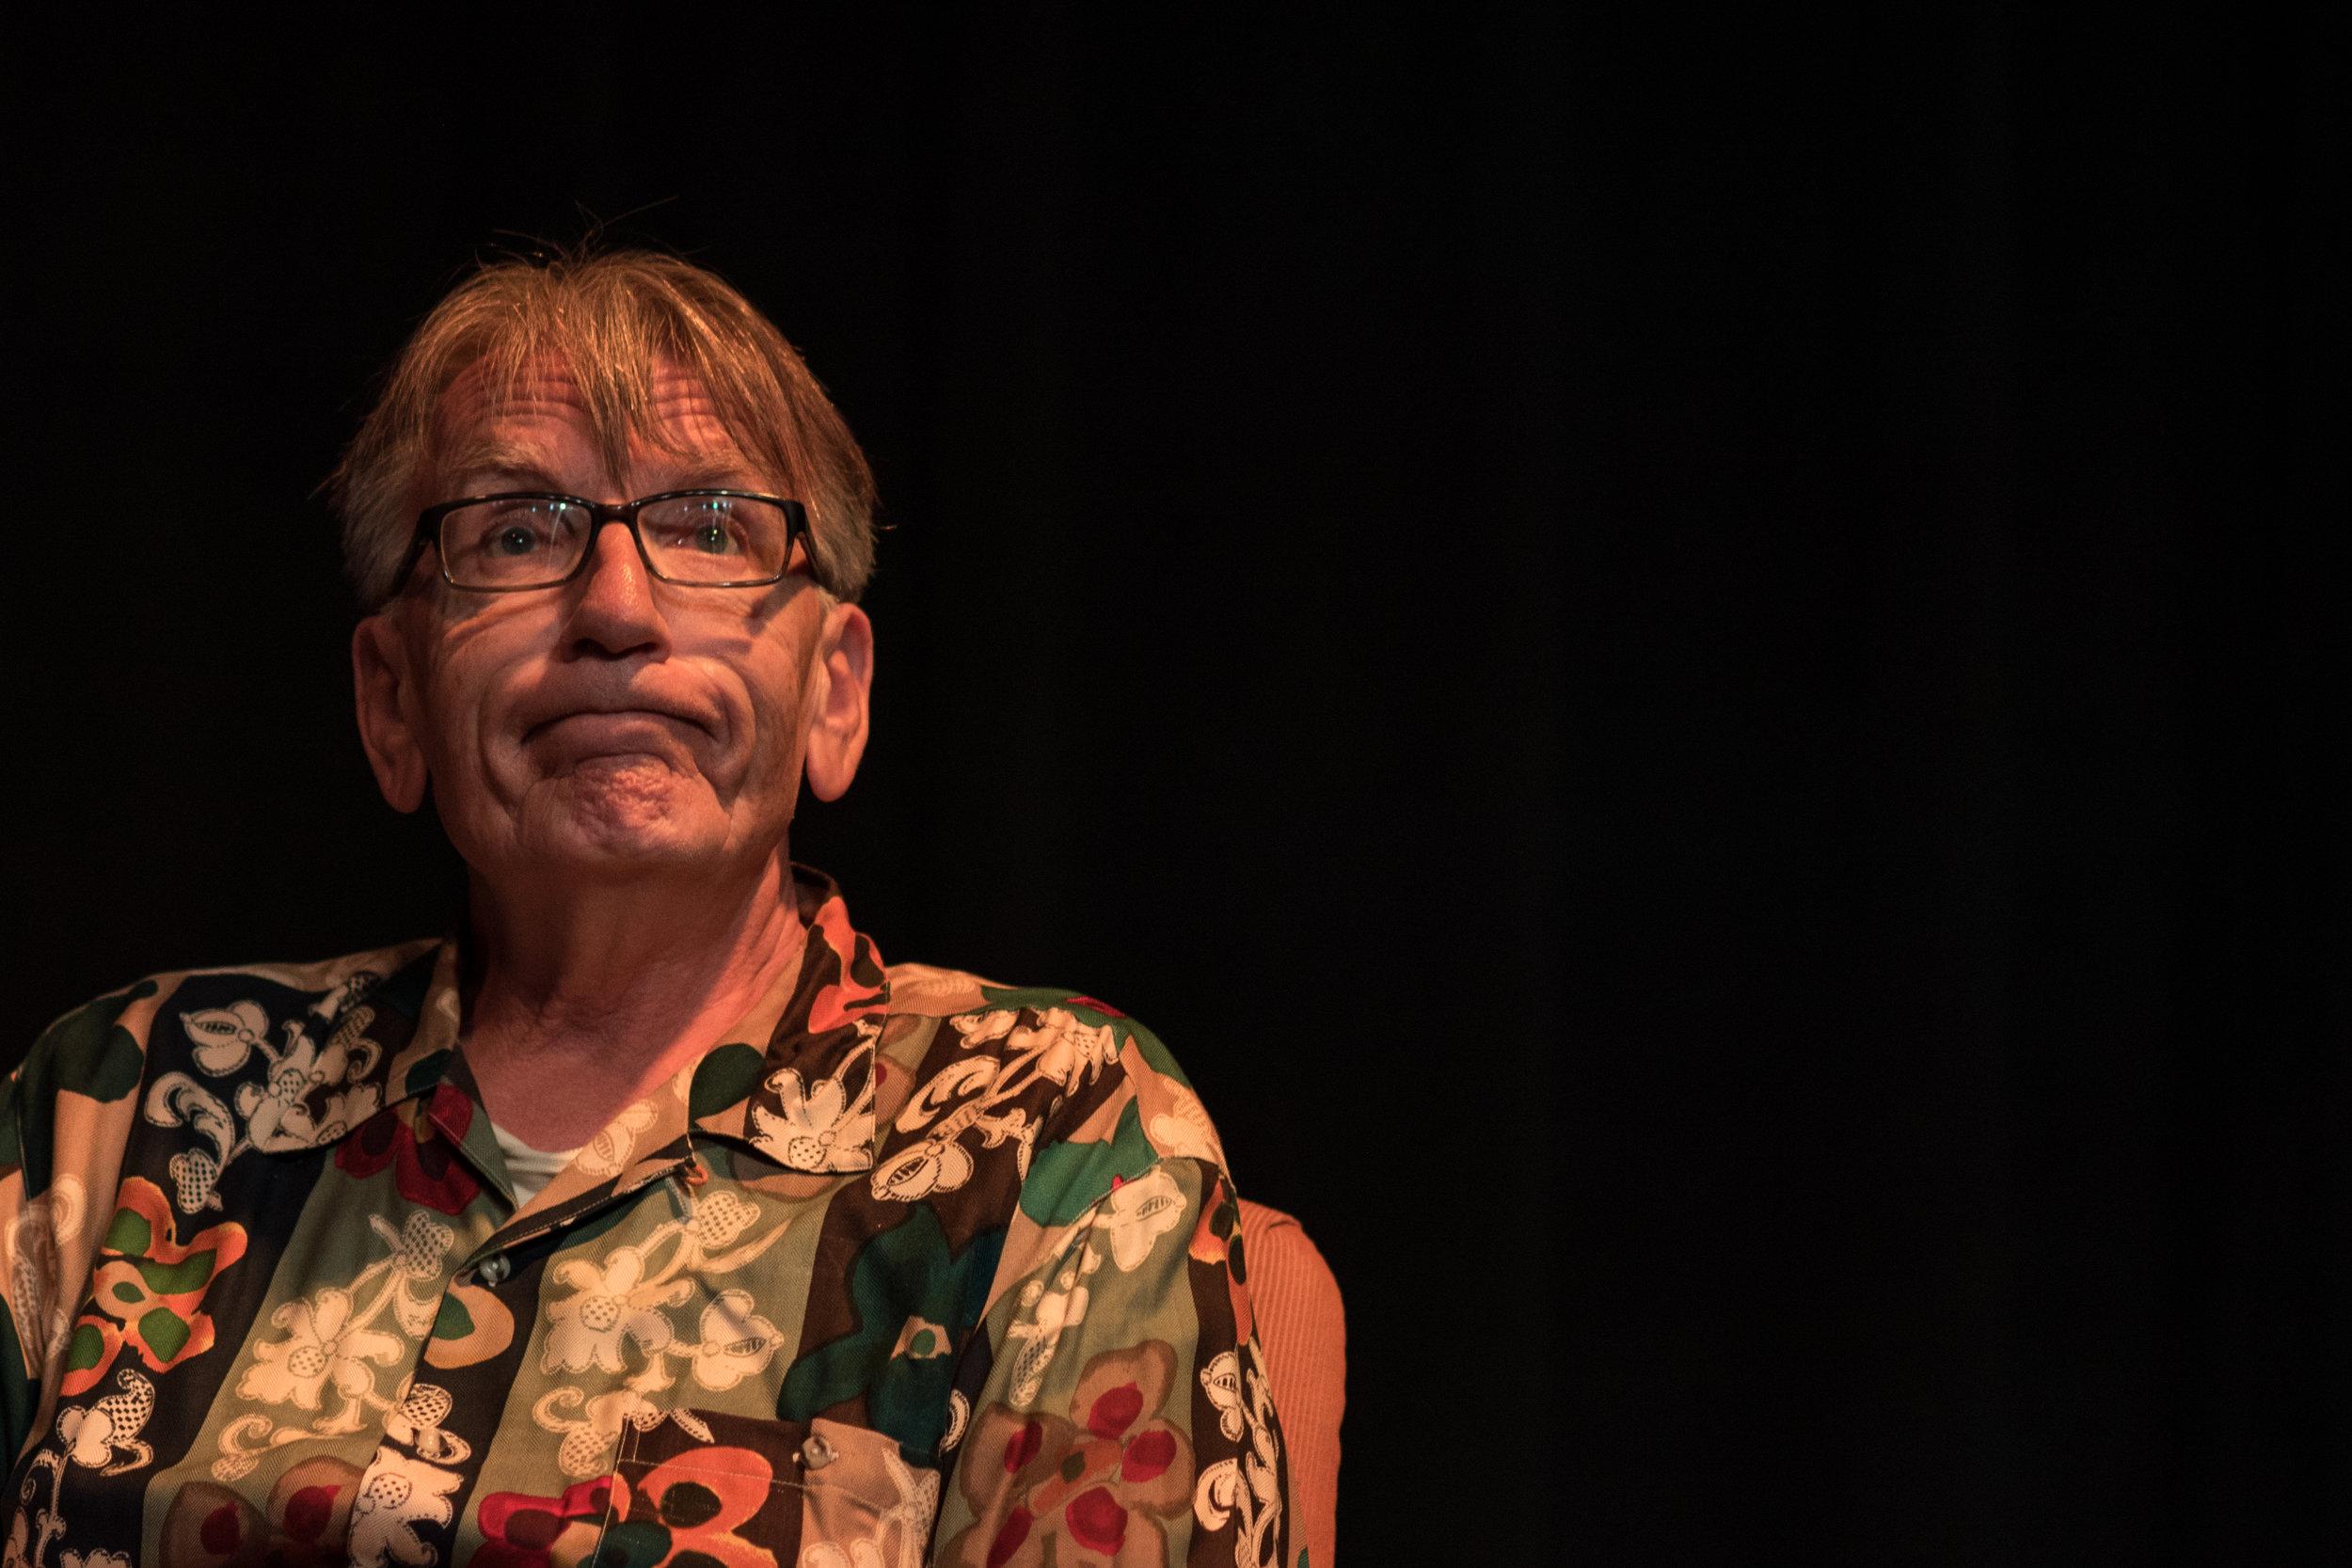 The Bennett TheatreLab & Conservatory: Festival of Plays, 2018 John Muller